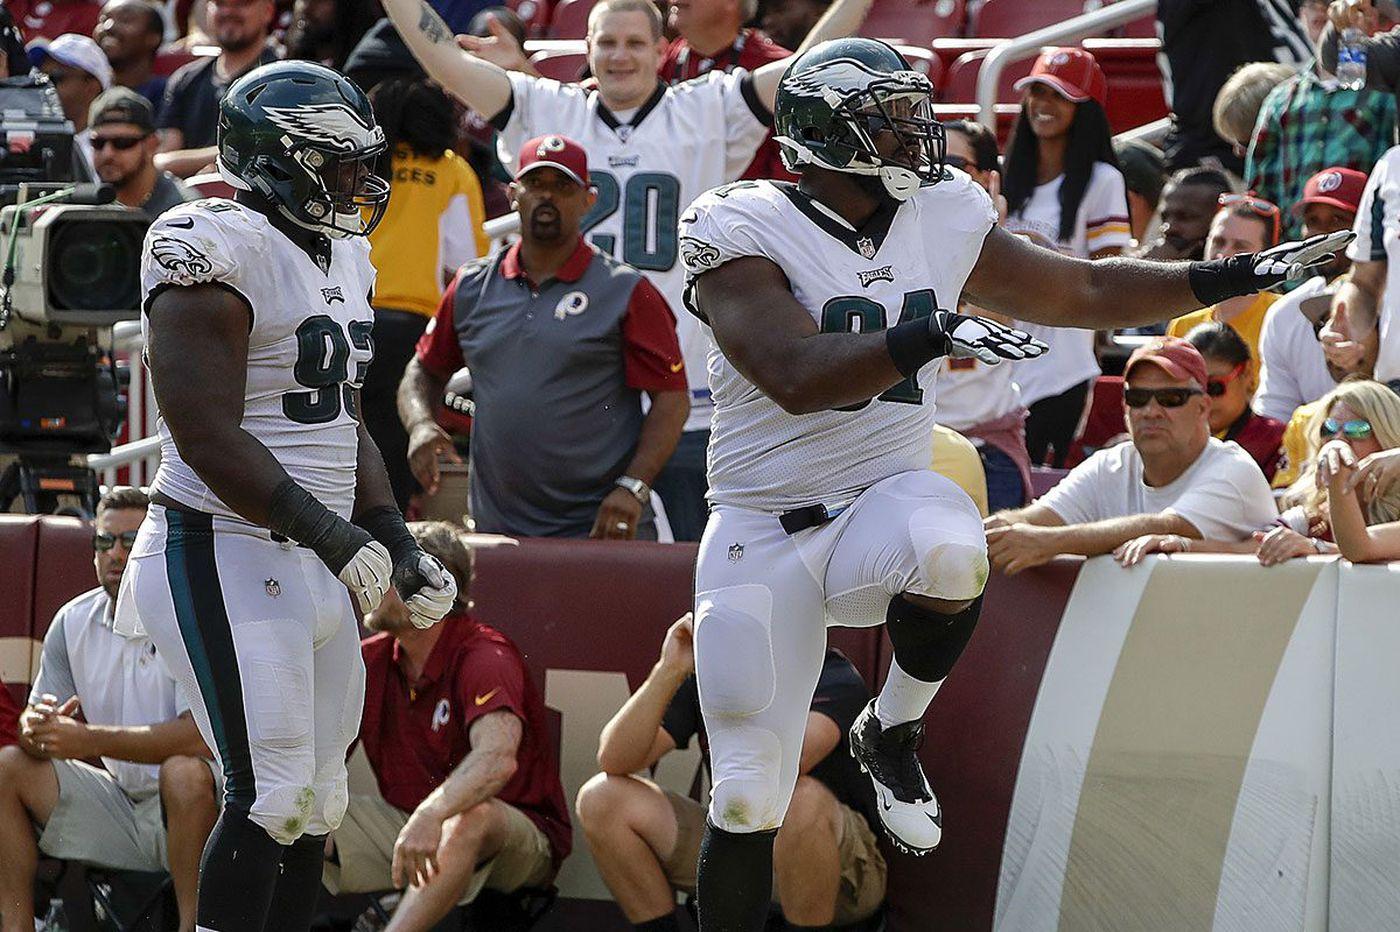 Eagles defense overpowers Washington in season-opening 30-17 win